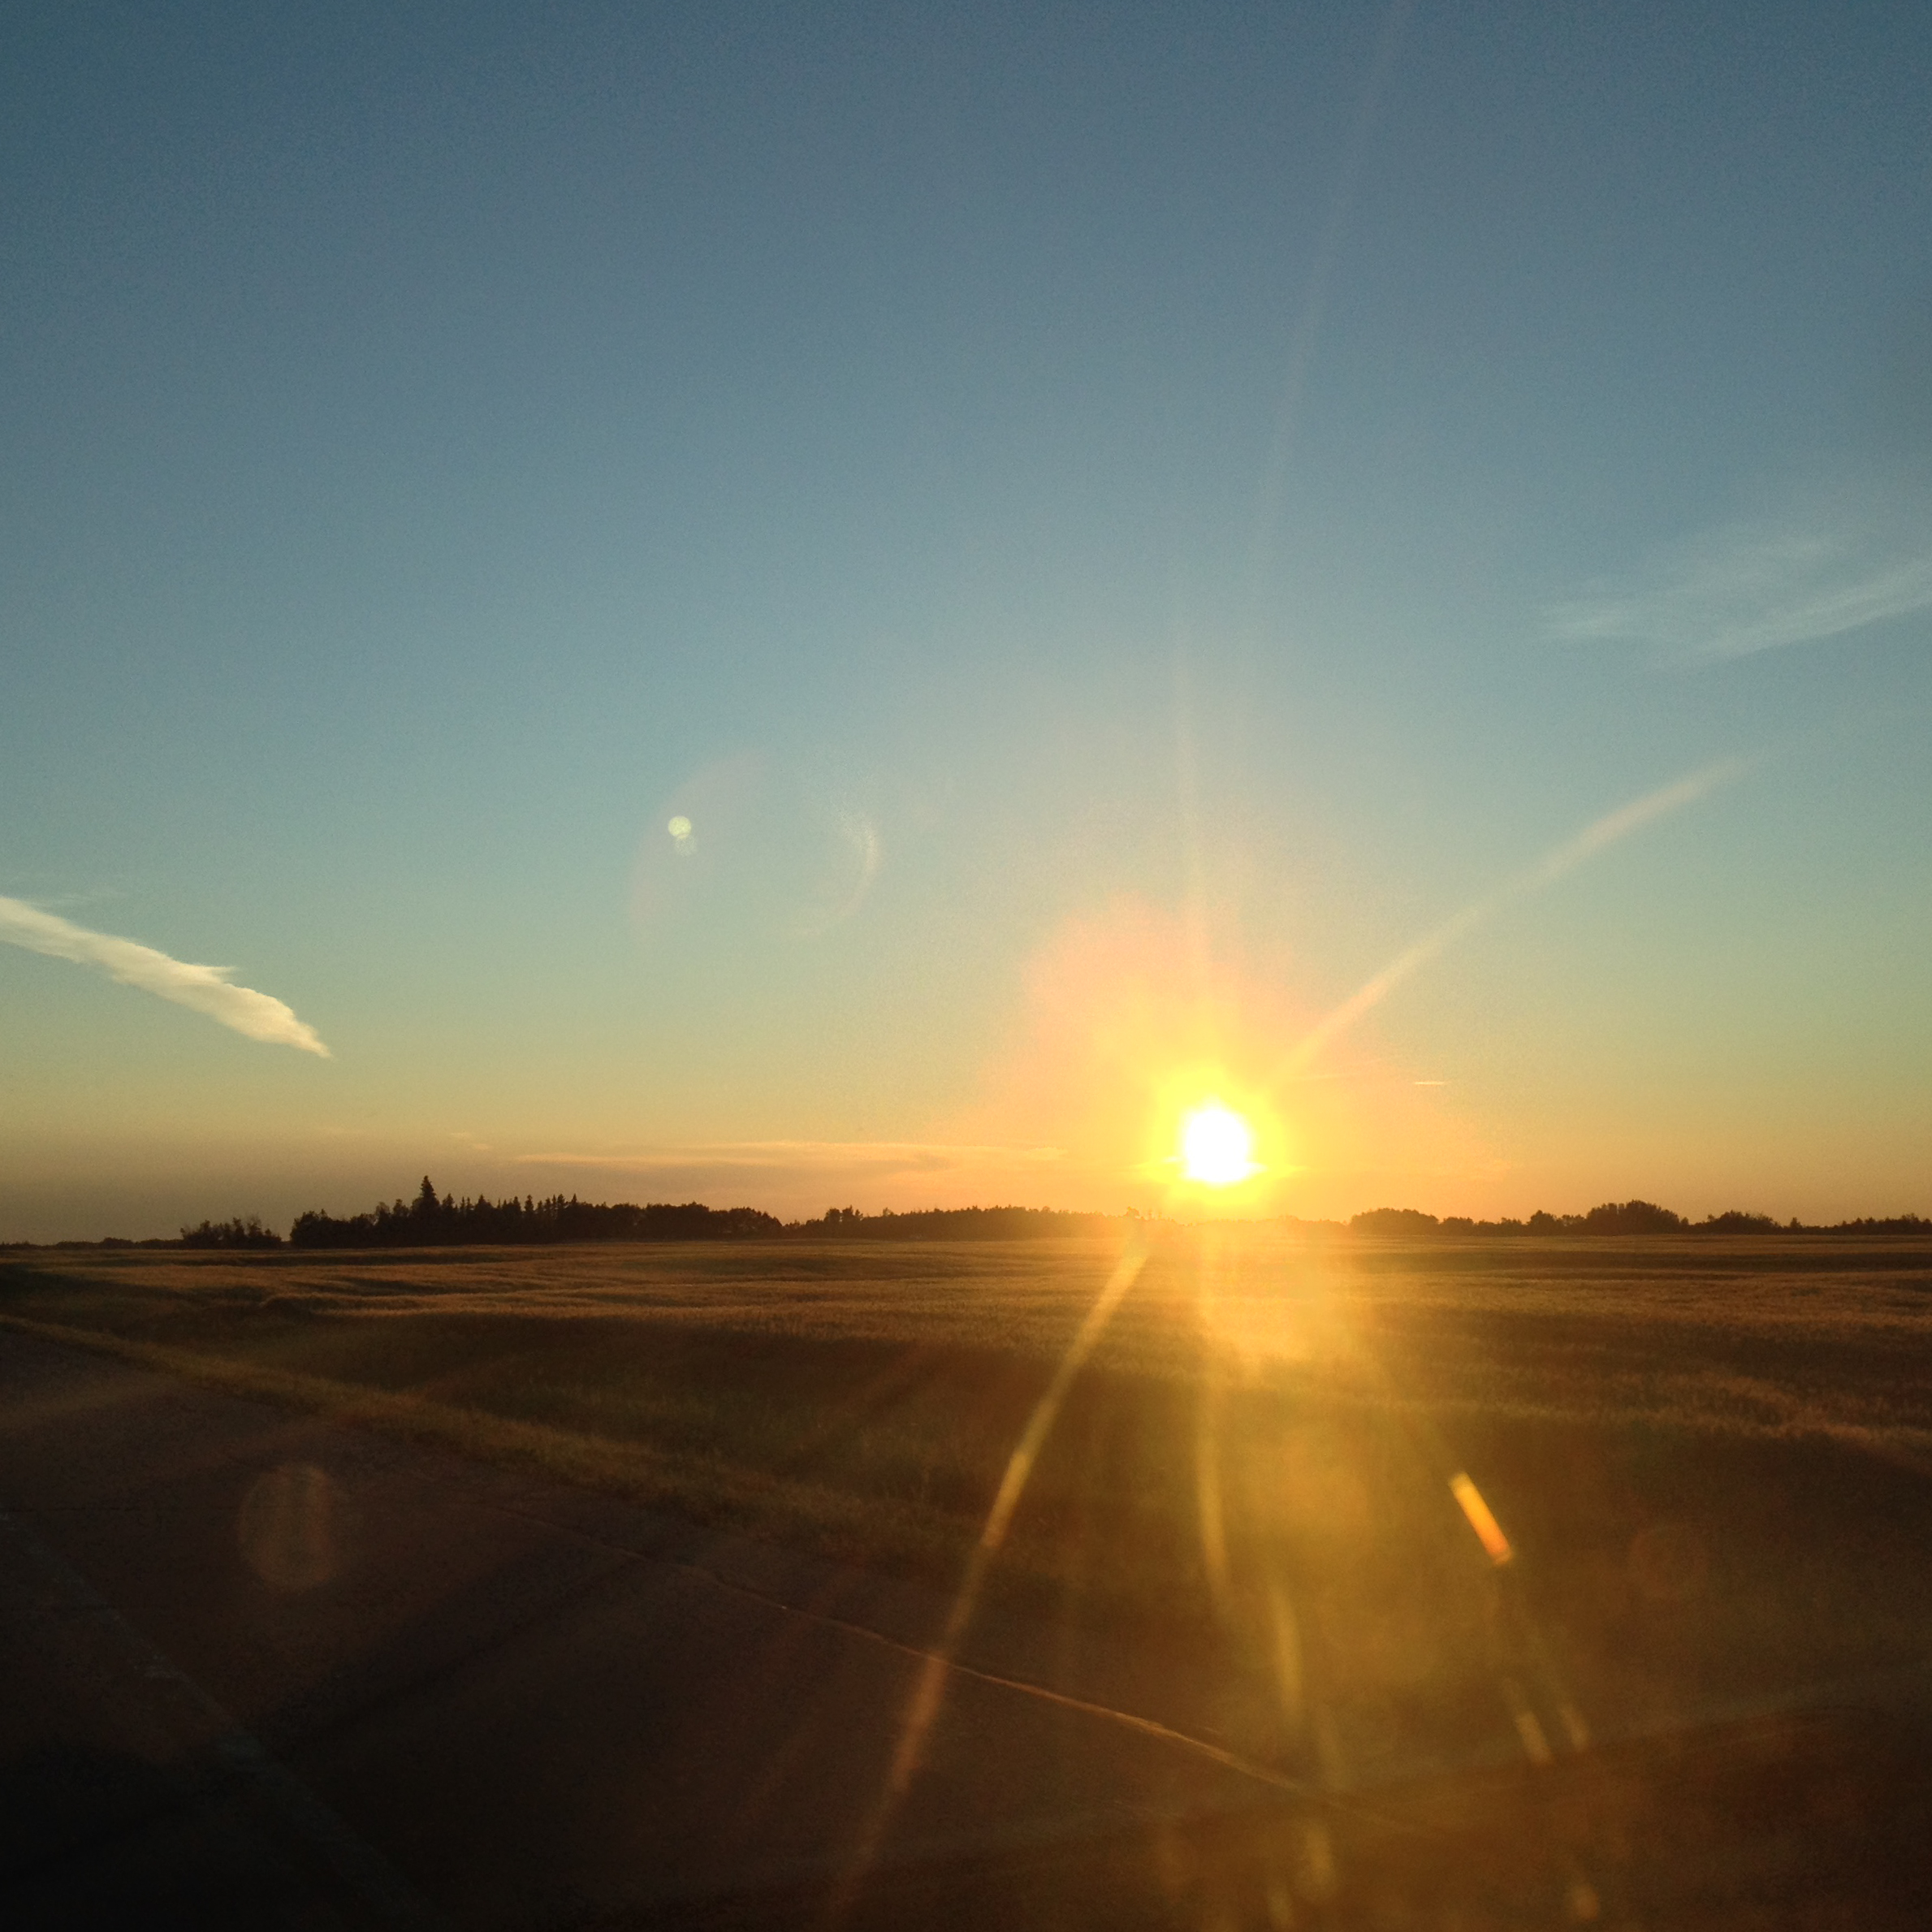 Driving to Edmonton